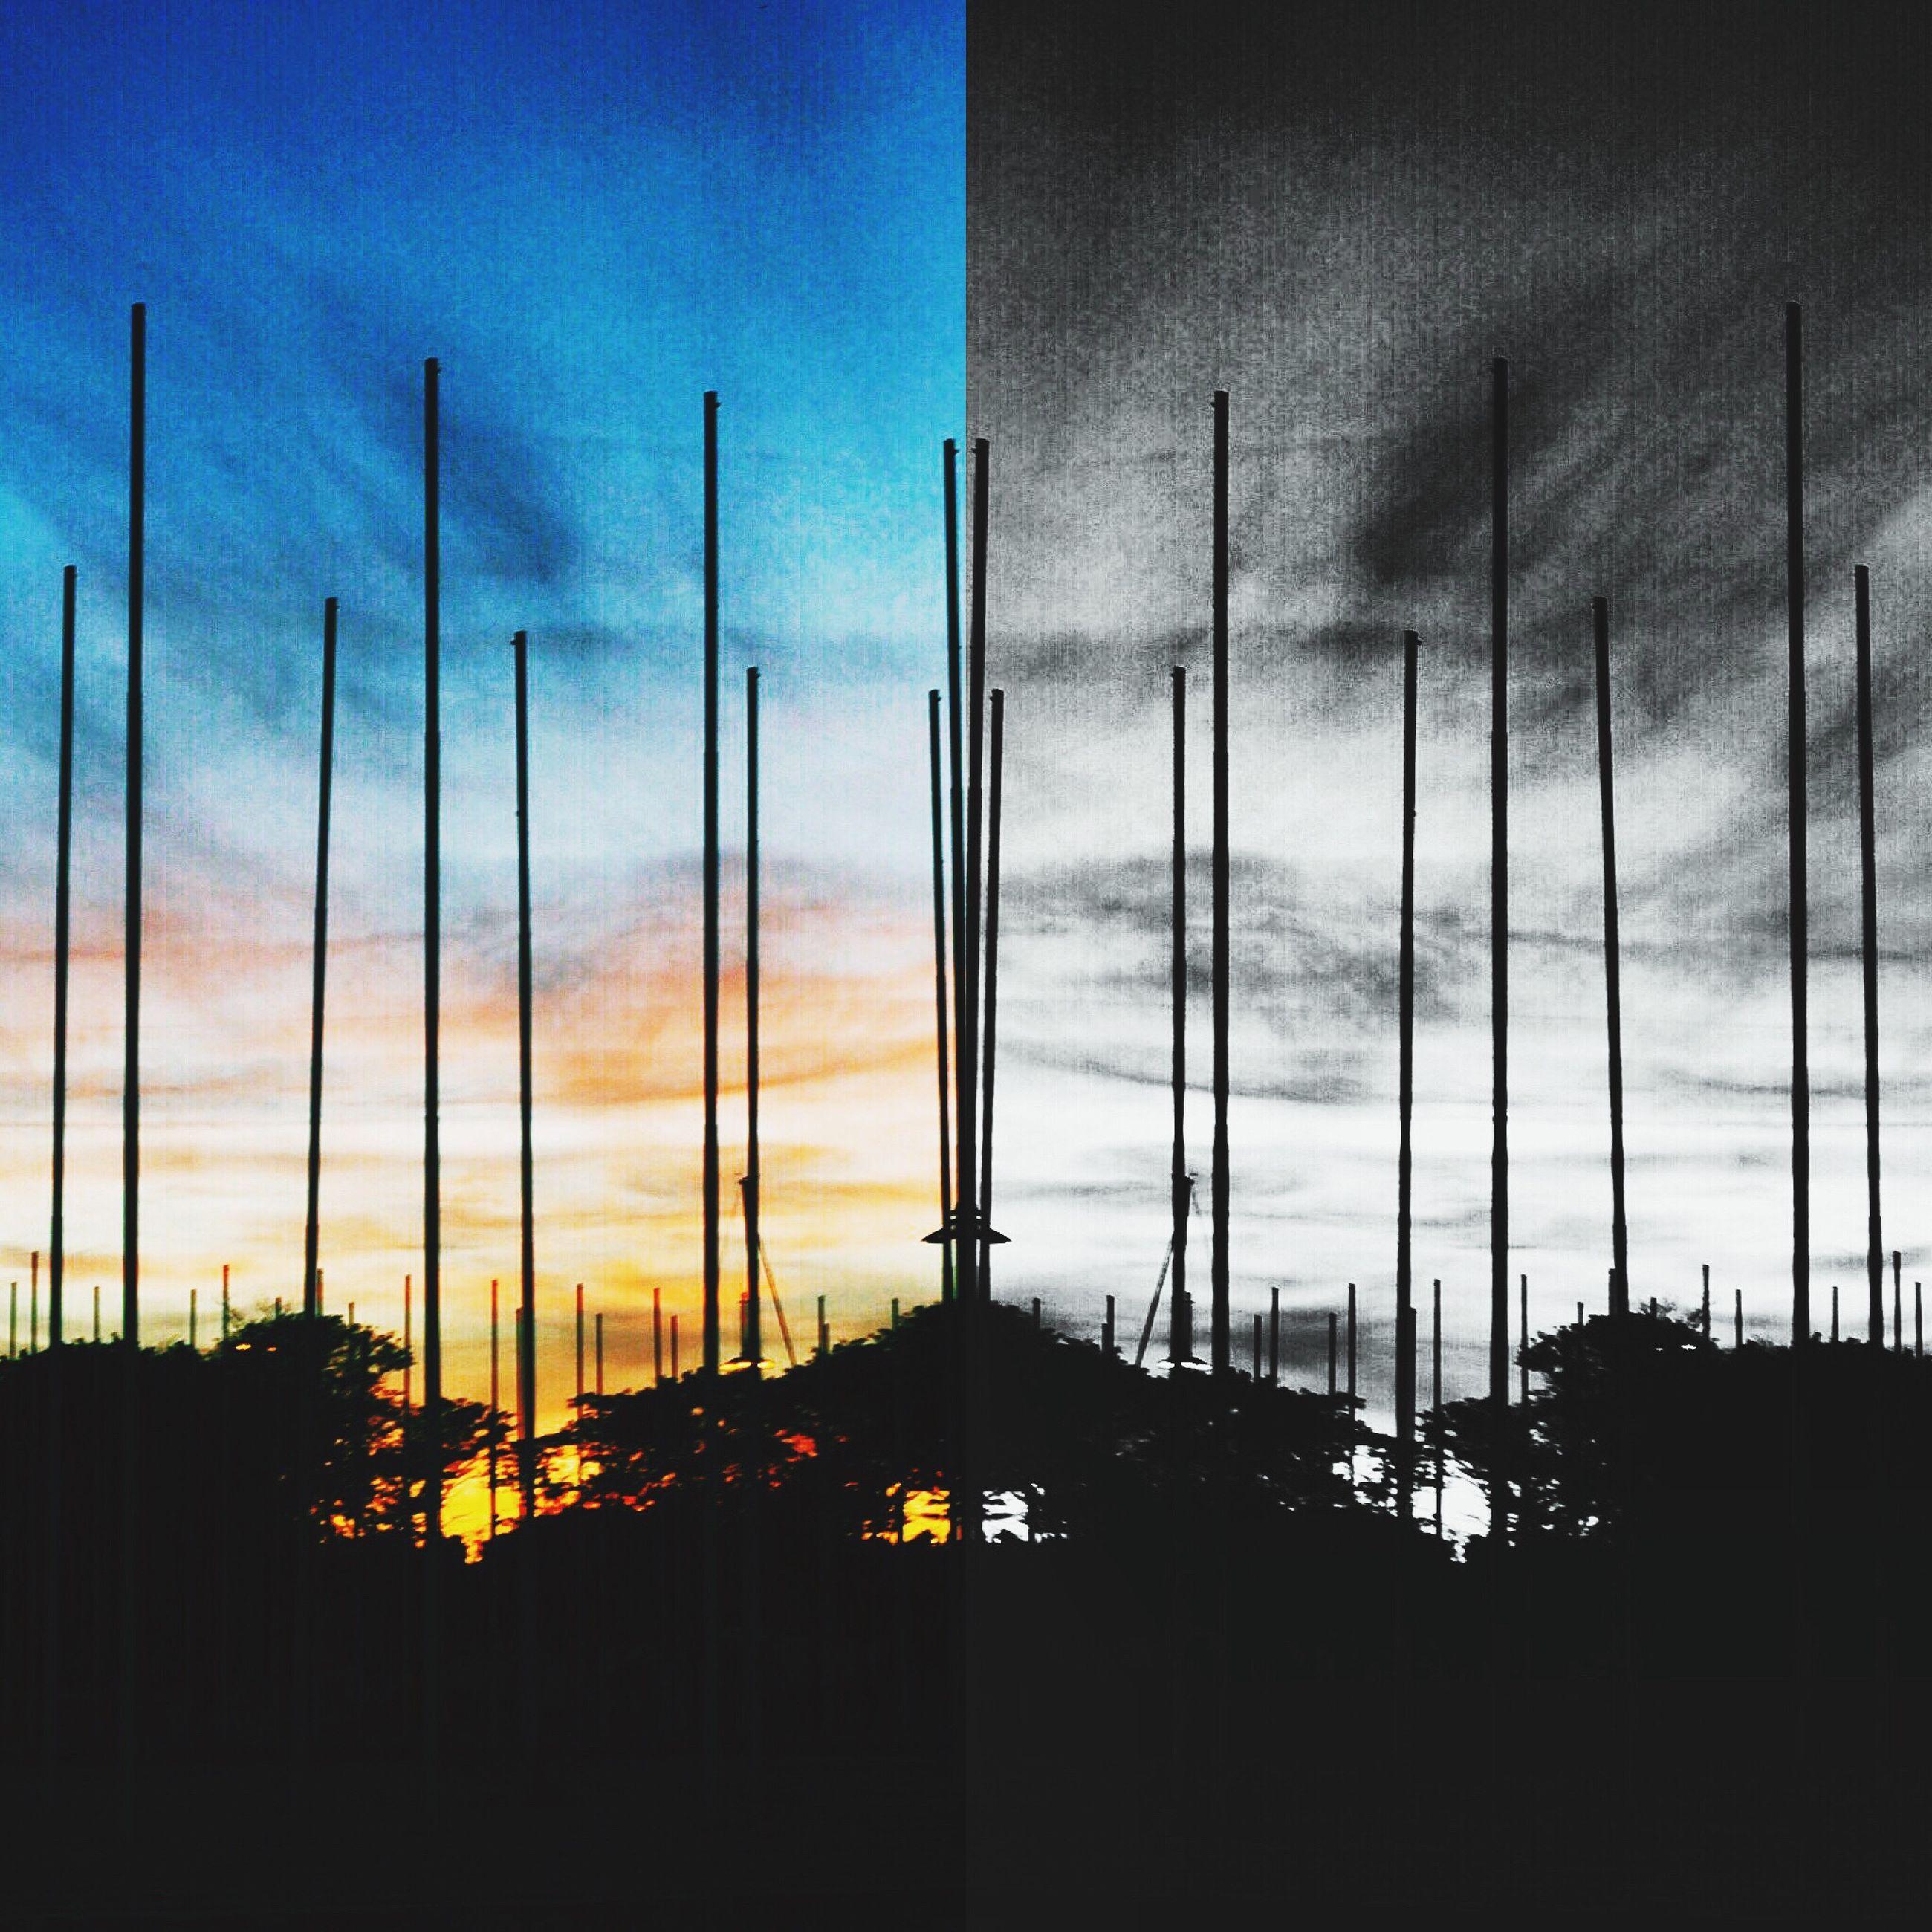 sky, architecture, built structure, sunset, building exterior, cloud - sky, silhouette, low angle view, cloud, city, dusk, transportation, cloudy, no people, outdoors, street light, blue, building, orange color, illuminated